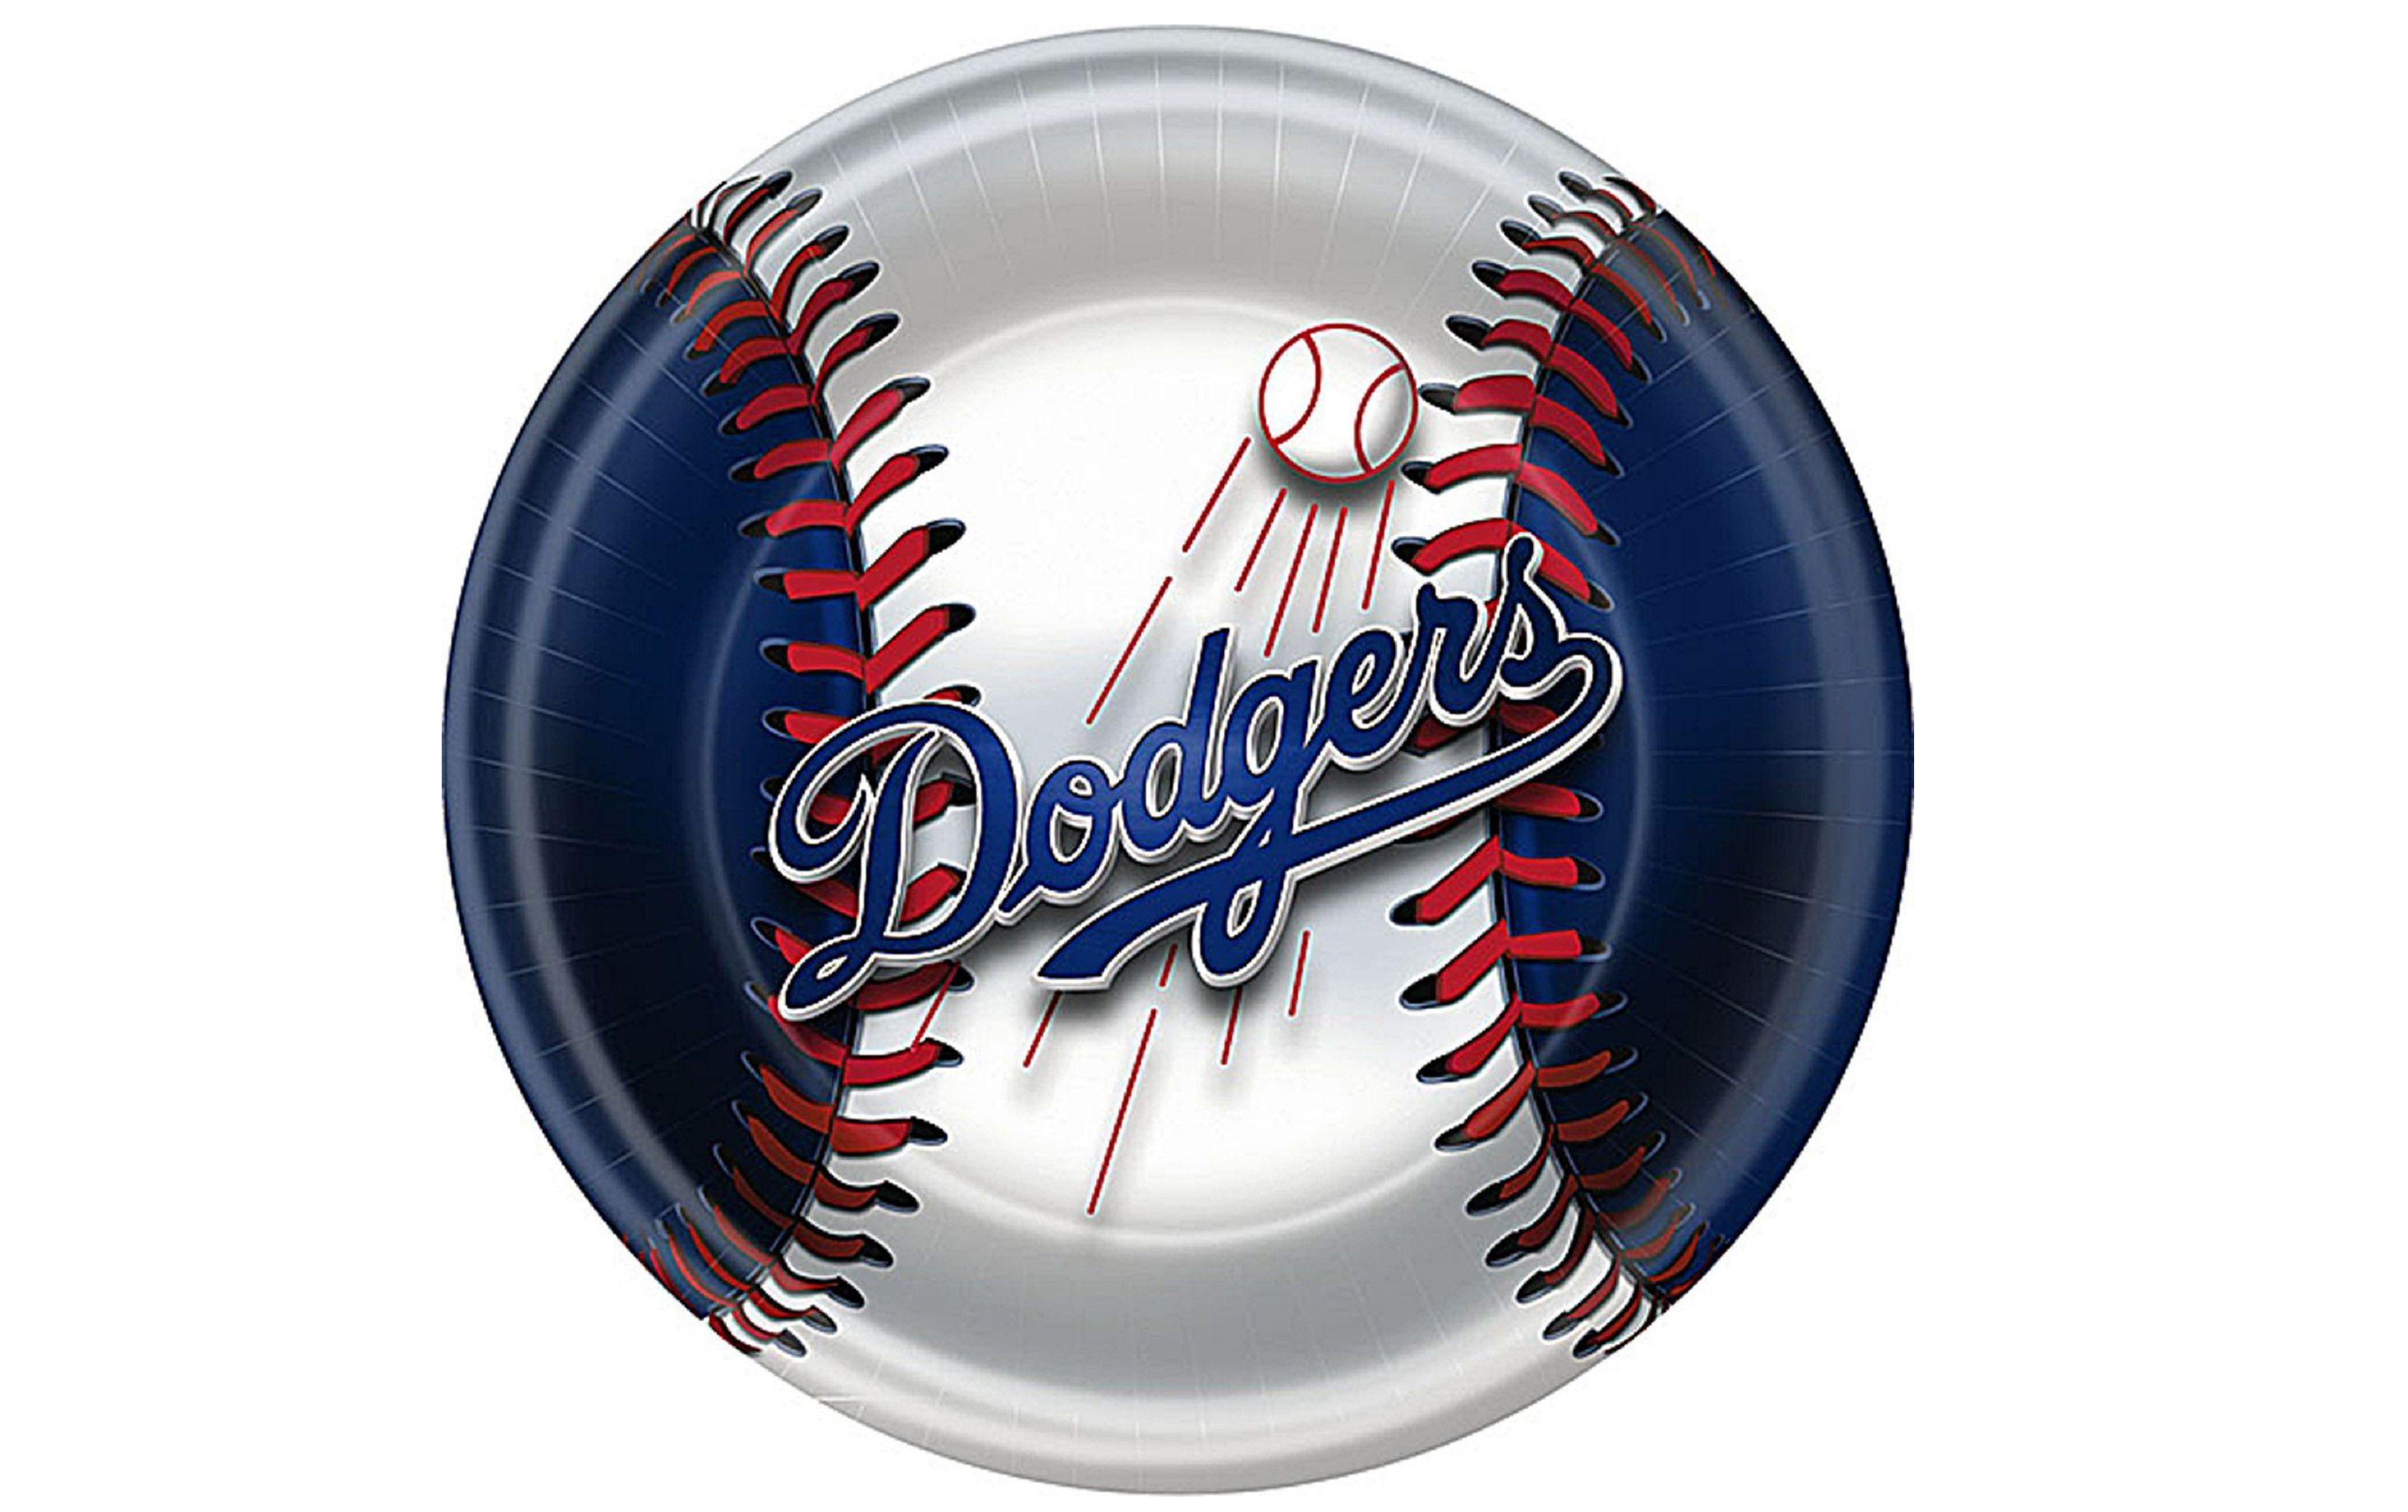 Los Angeles Dodgers Images